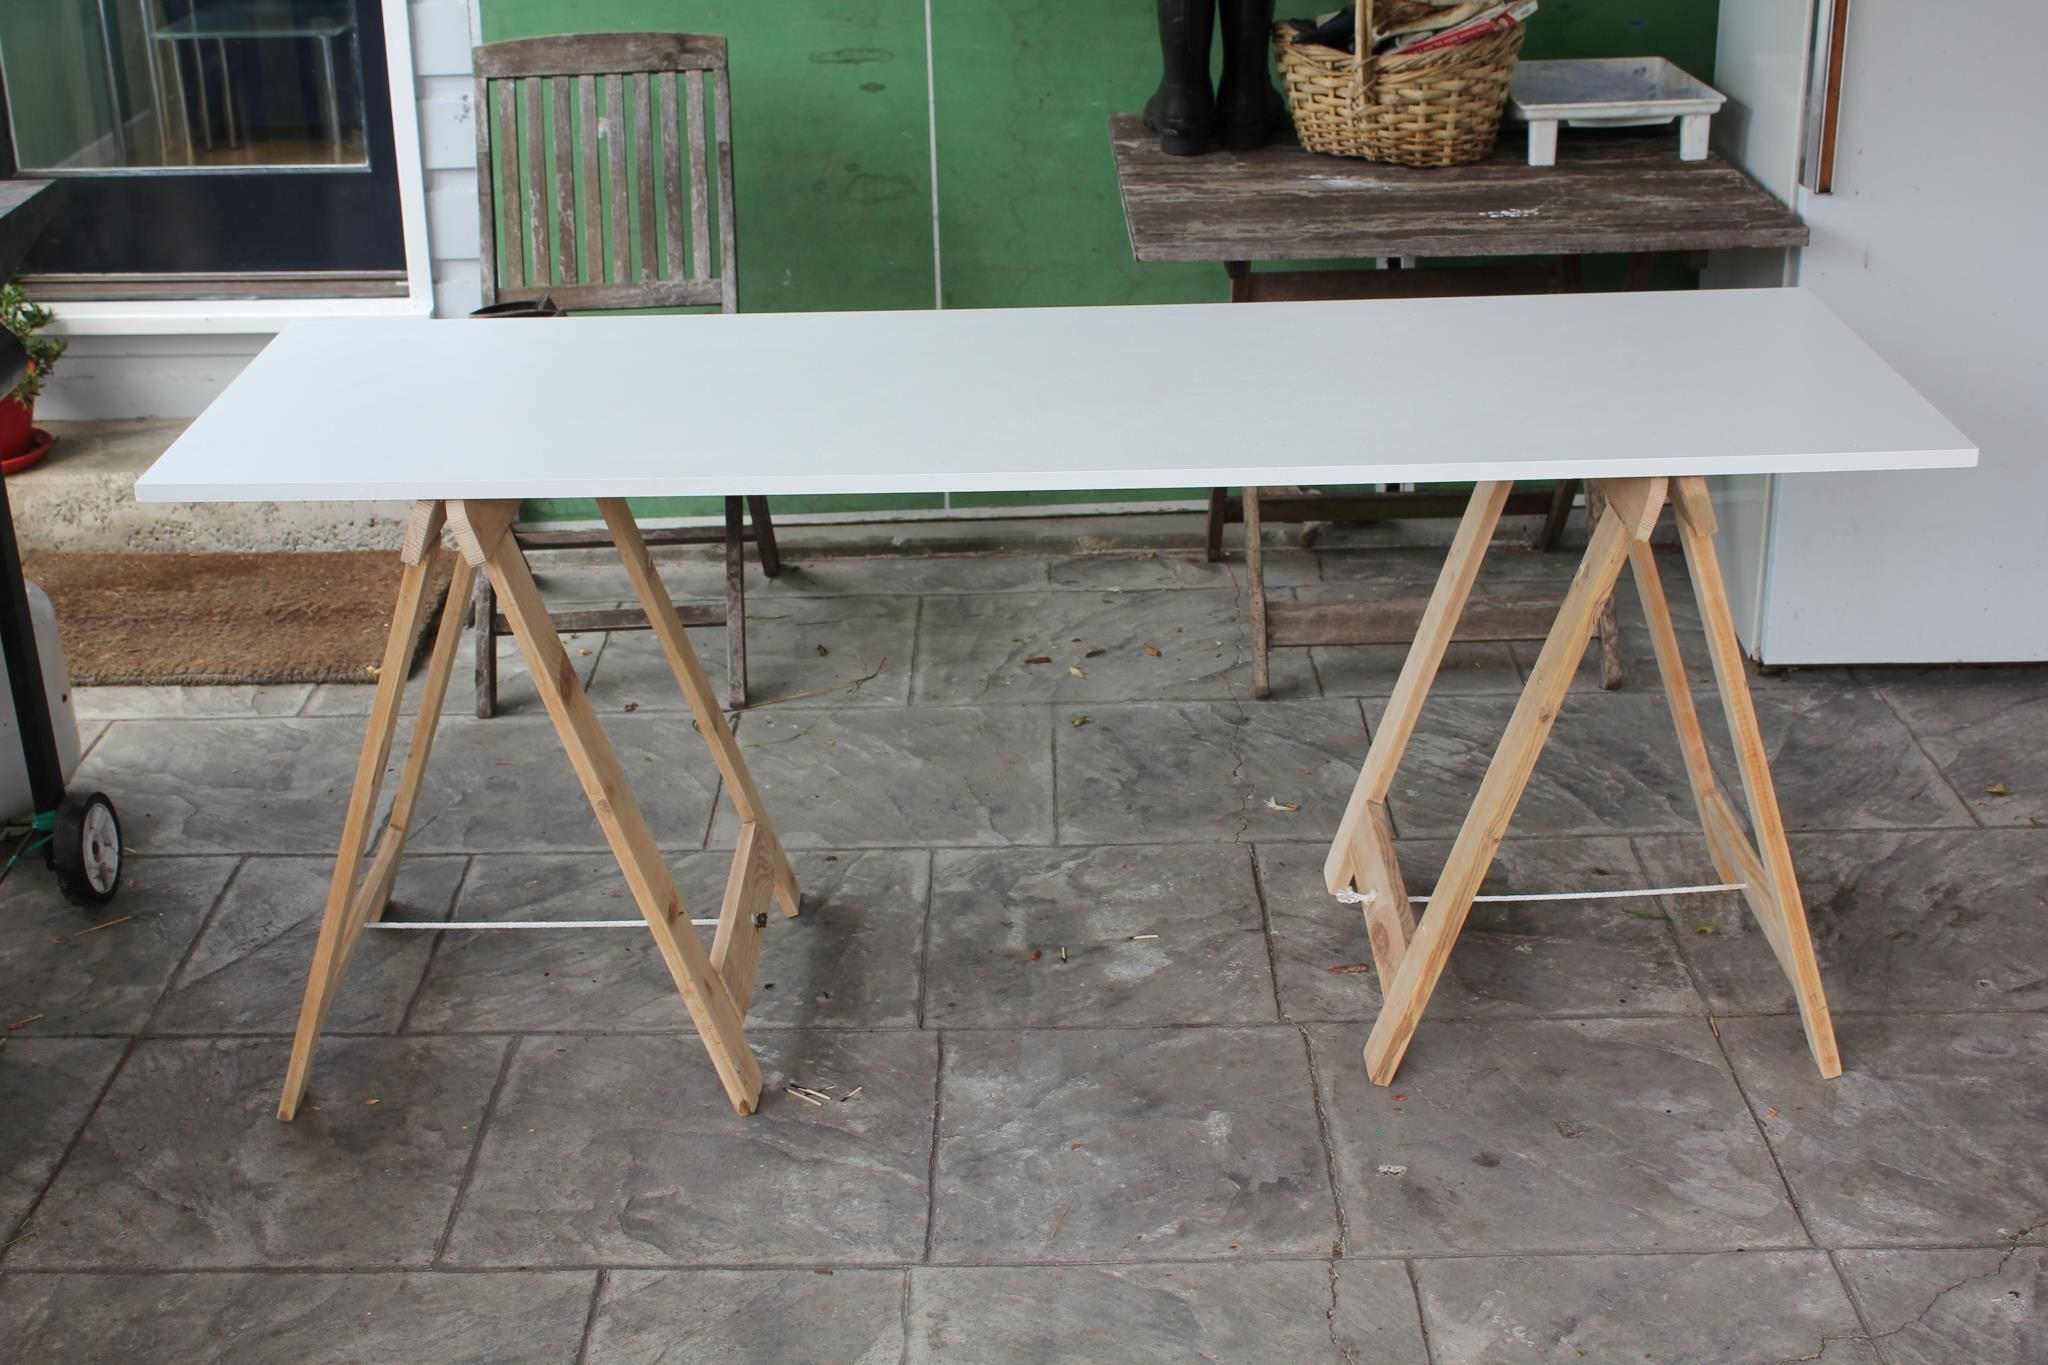 DIY Trestle table | Crafty Little Minx | Pinterest